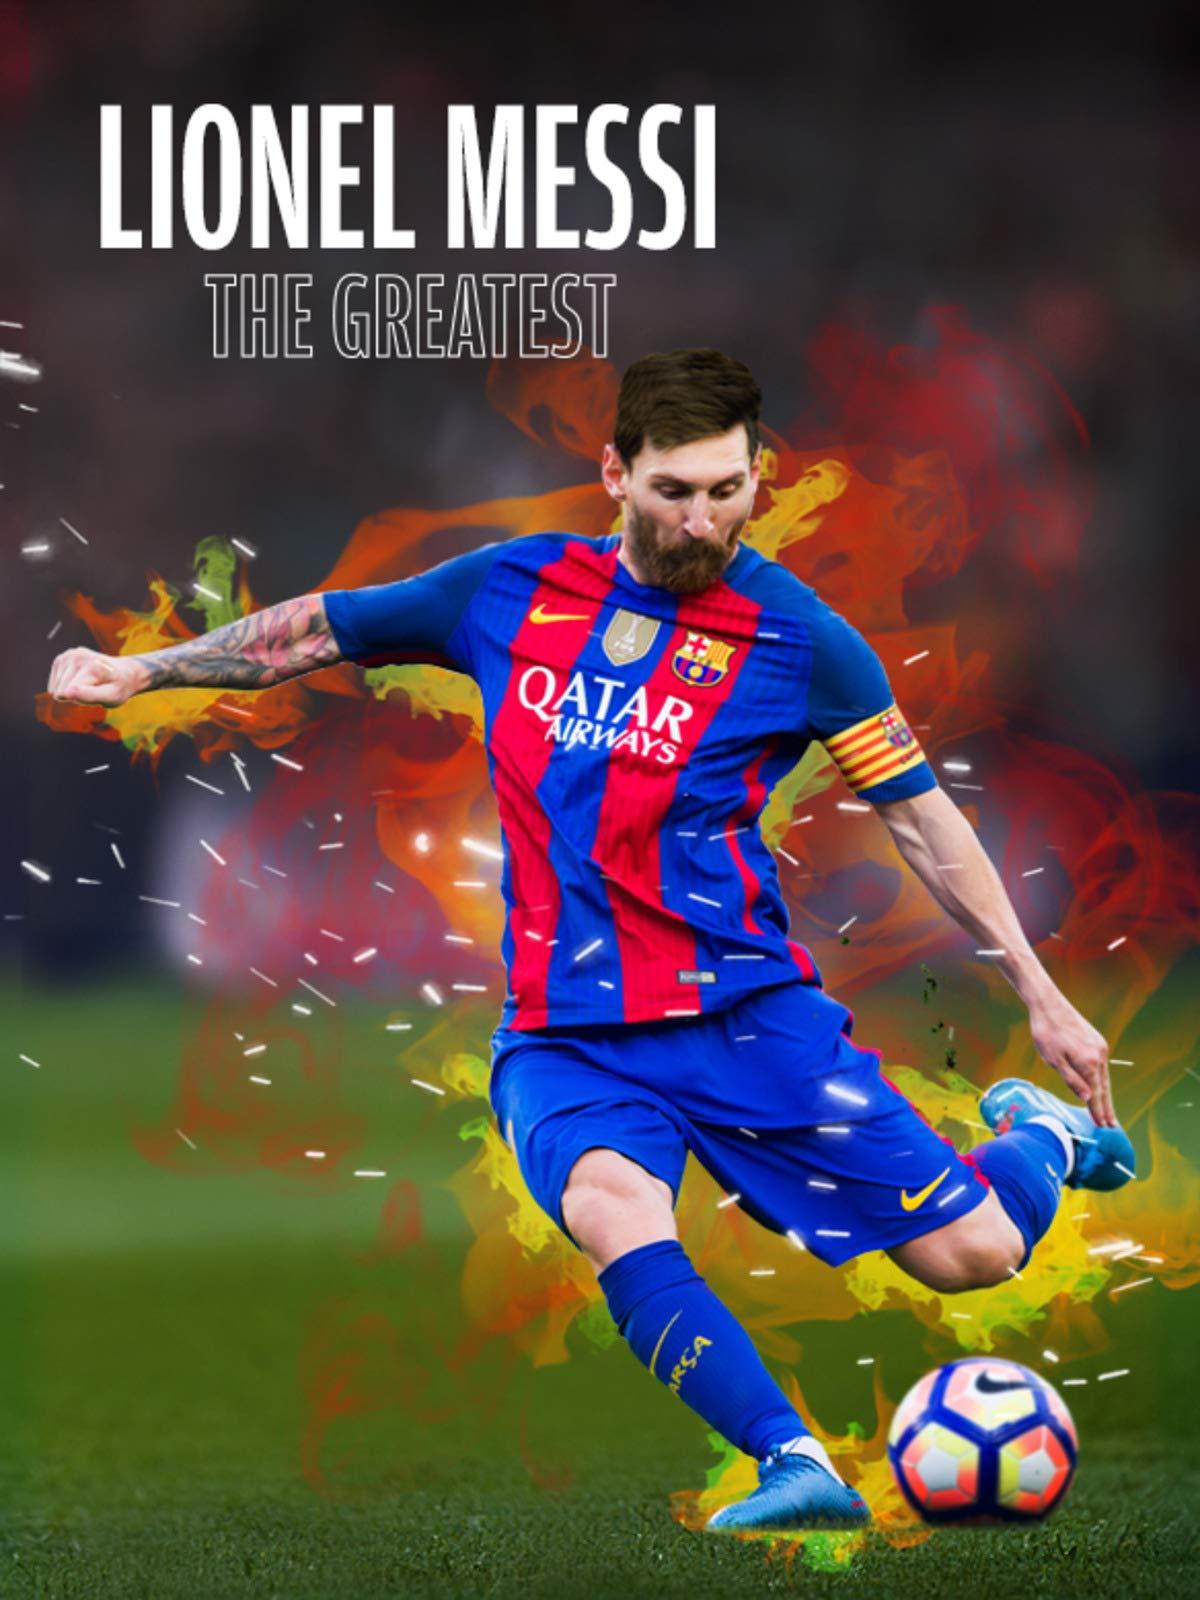 Lionel Messi: The Greatest